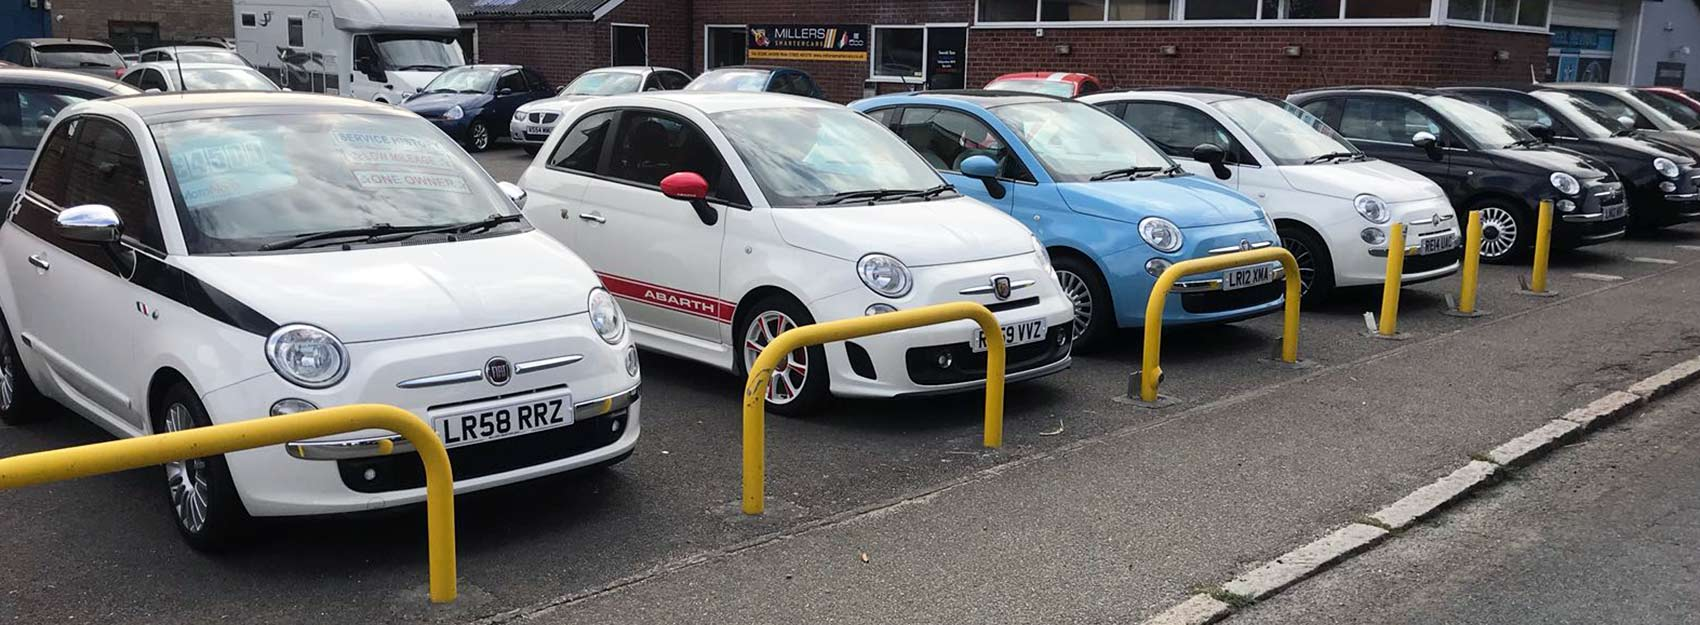 Fiat 500, Fiat Abarths, Colchester, Essex, UK